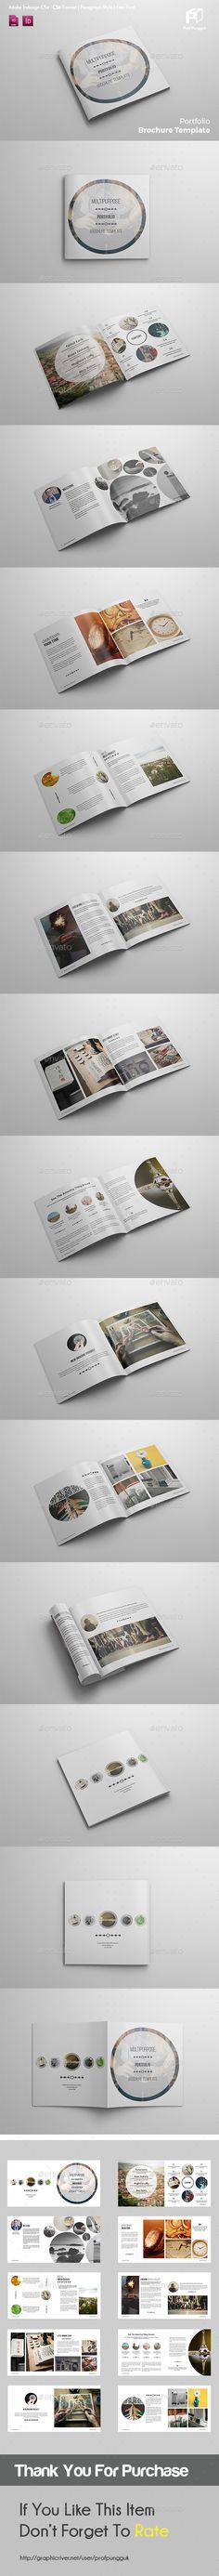 Square Brochure Template InDesign INDD. Download here: https://graphicriver.net/item/square-brochure-vol1/17546146?ref=ksioks